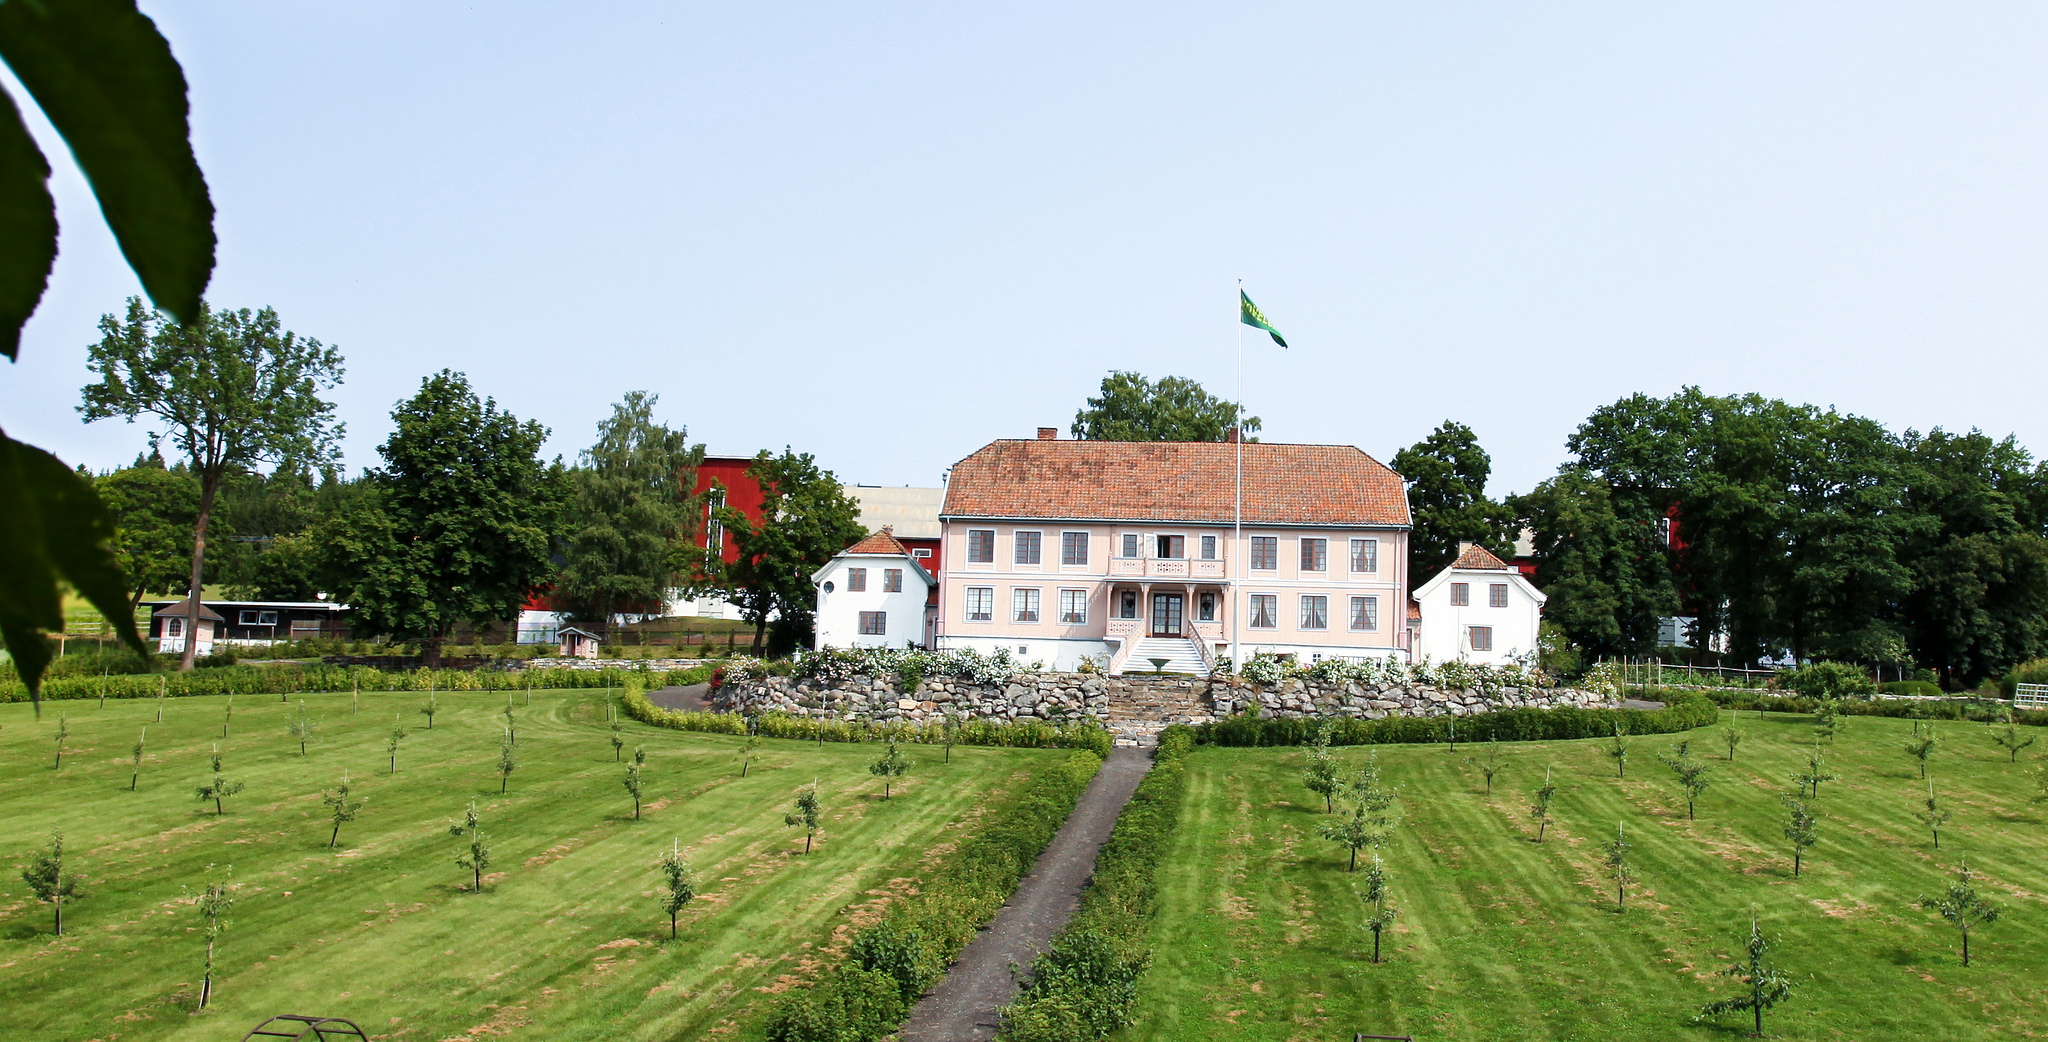 Hovelsrud Villa, Helgøya Island, Nes på Hedmarken, NORWAY. Photo: Haavard Gjelseth, Trond Lillebo, Tor Henning Støldal and Nina Ruud